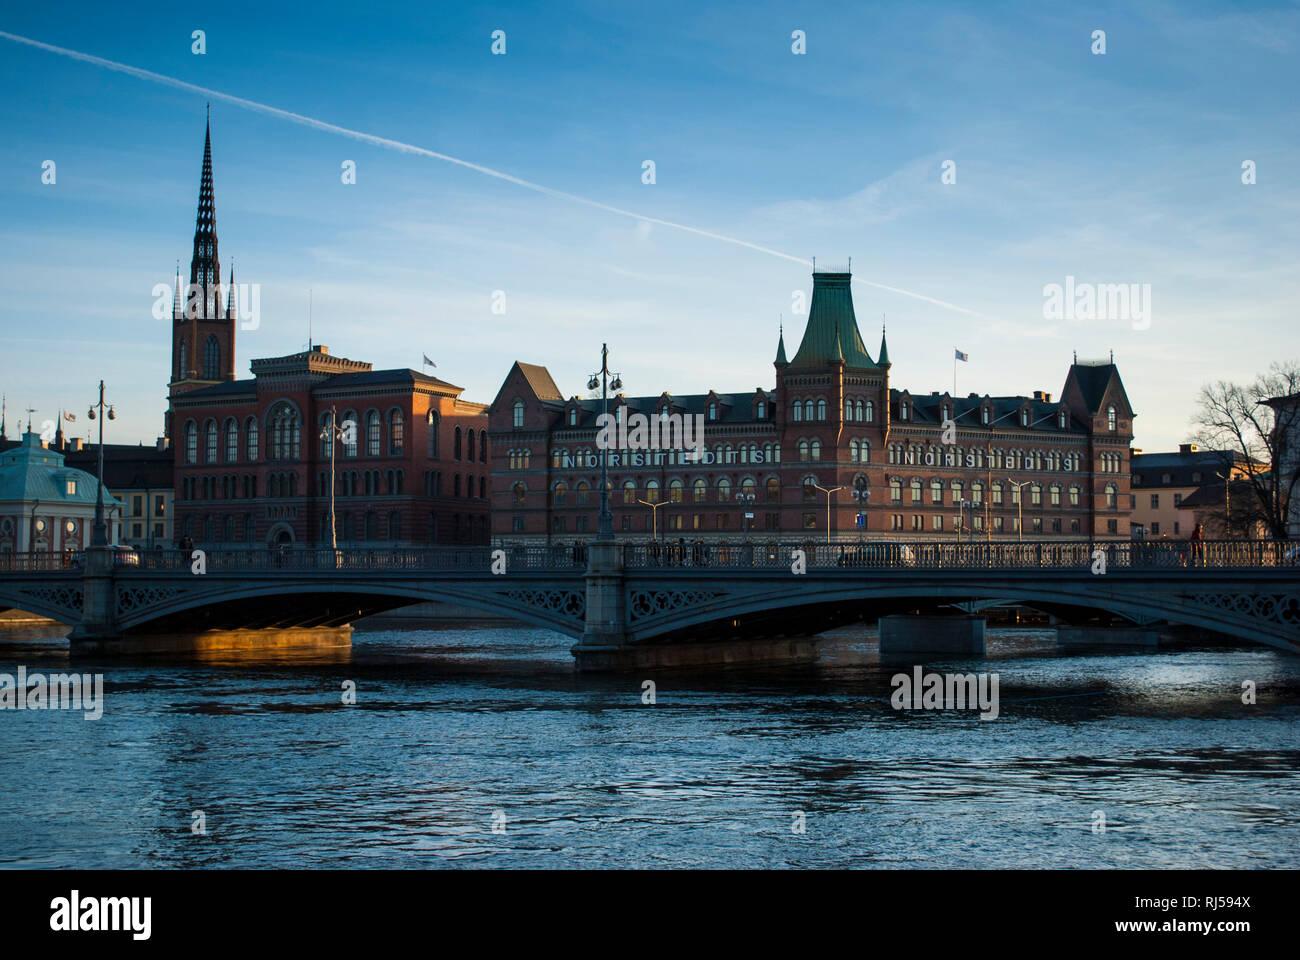 Blick auf Riddarholmen mit Riddarhuset, Riddarholmskyrkan und Norstedtshuset, Stockholm - Stock Image